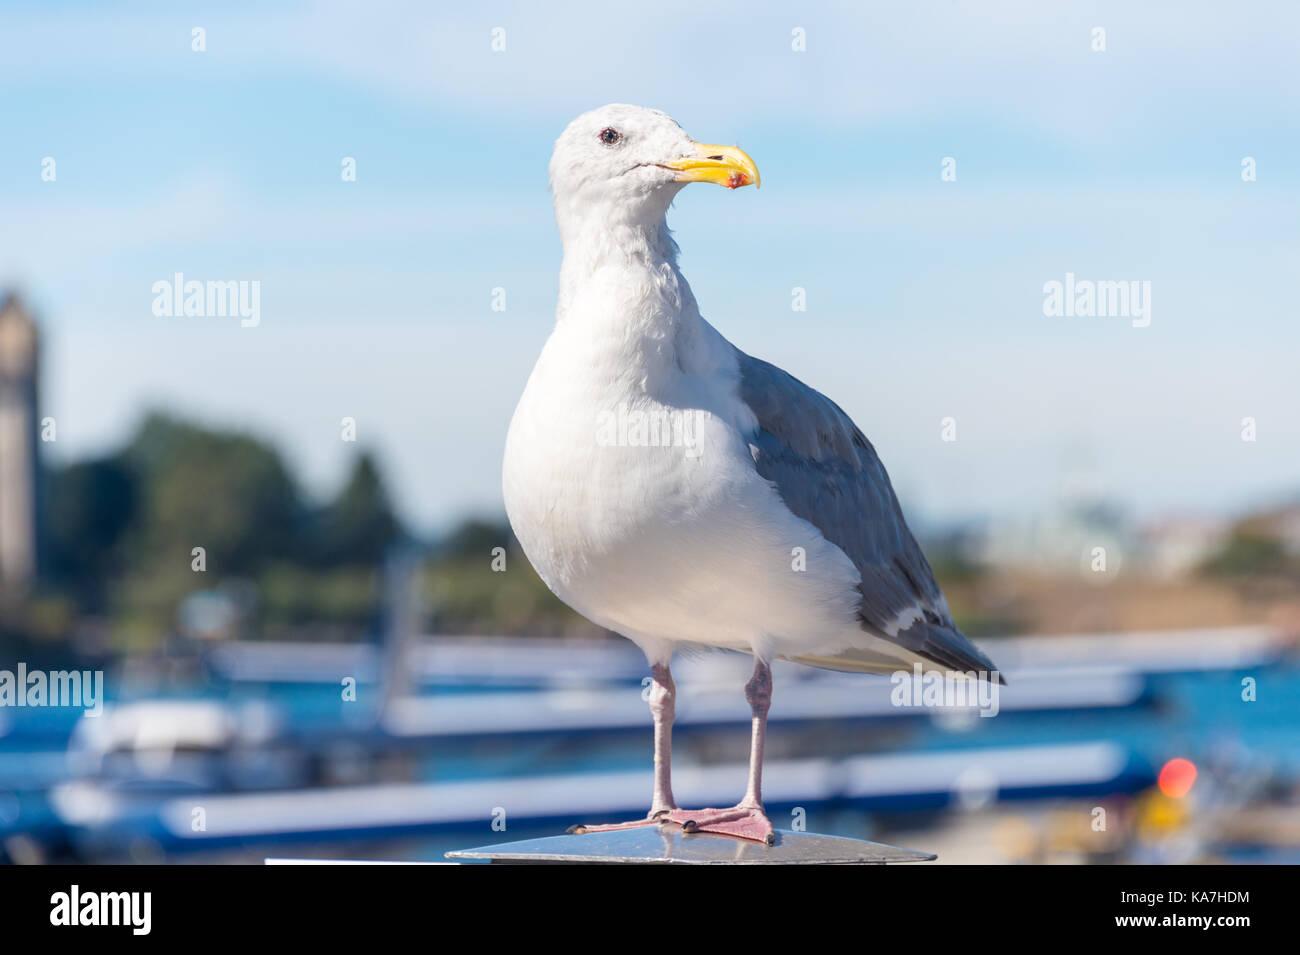 Glaucous-winged Gull in Victoria Harbour, British Columbia, Canada - Stock Image